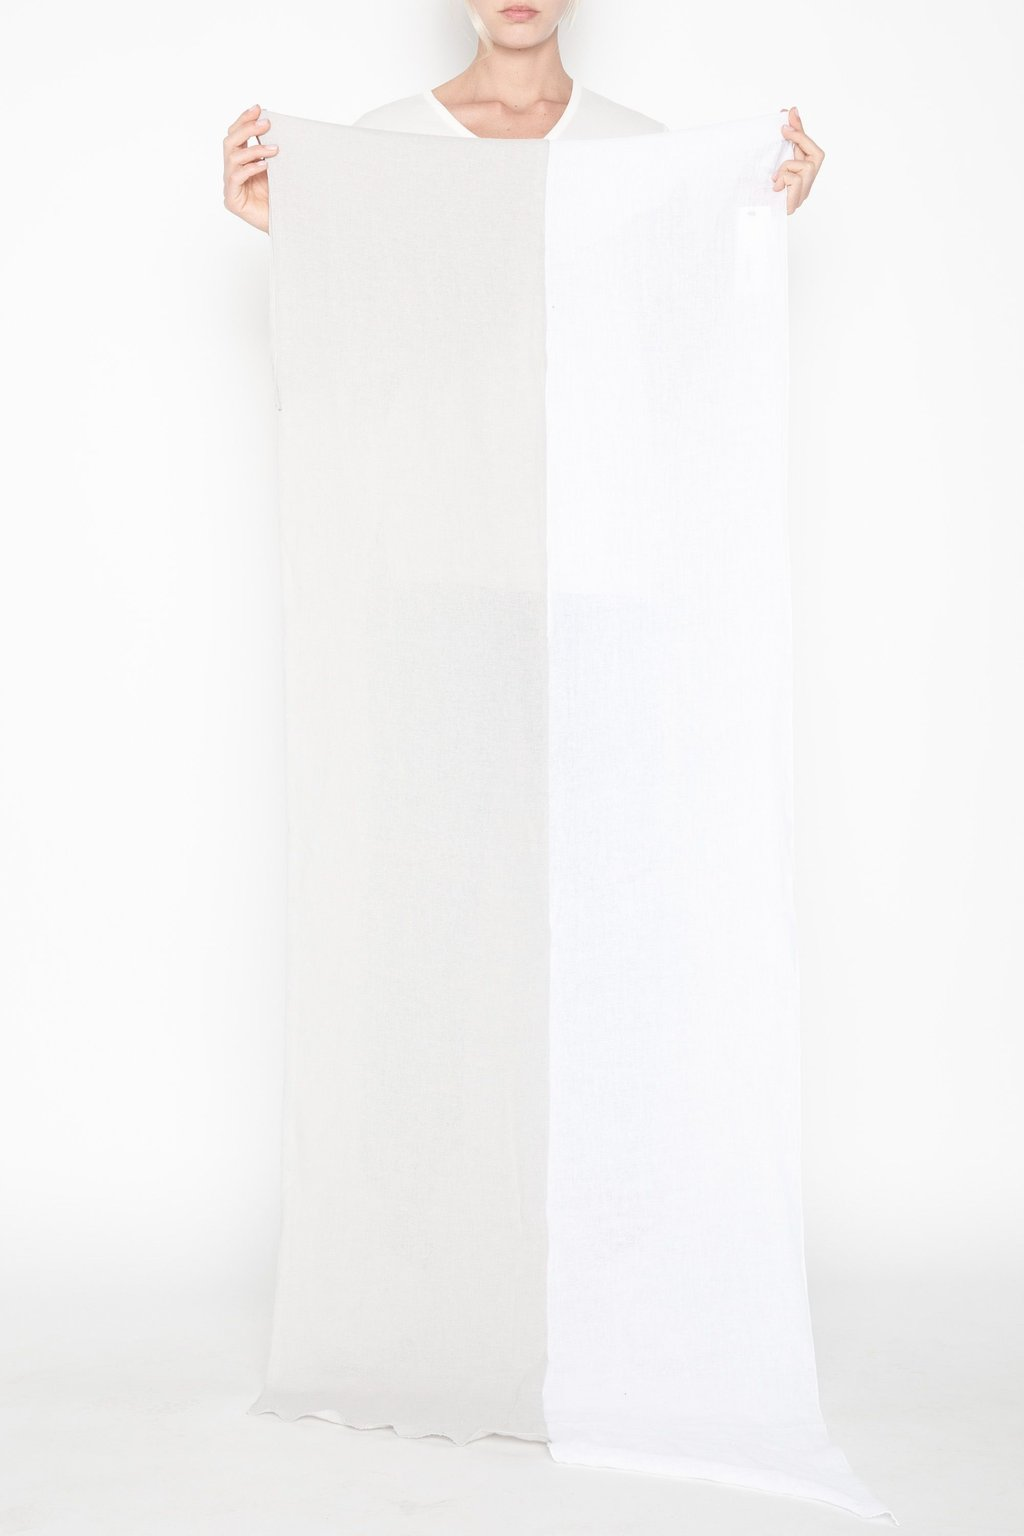 Scarf H018 Gray 2